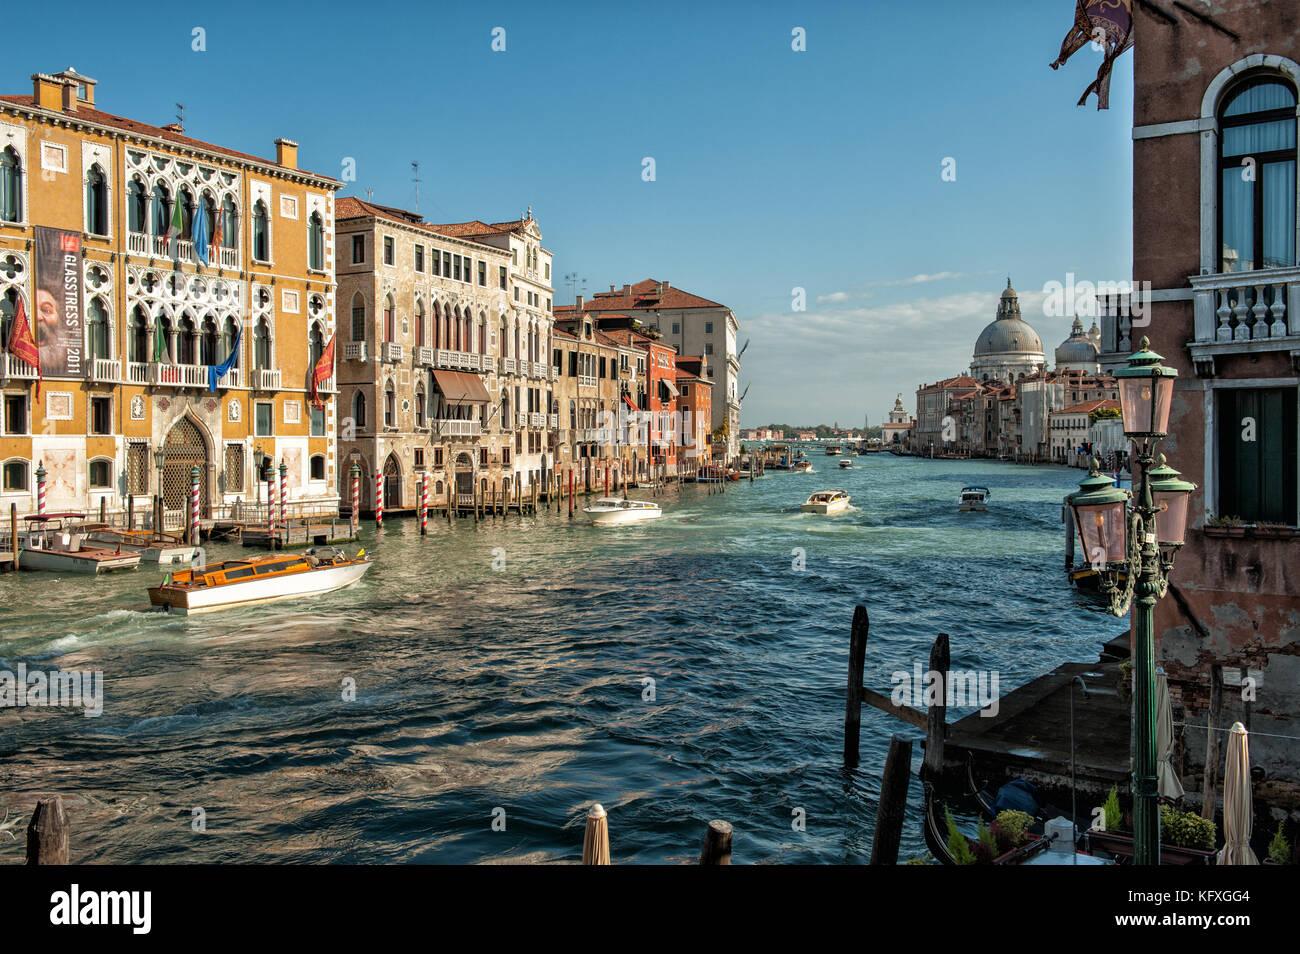 Palazzo Cavalli-Franchetti and Grand Canal in Venice, Italy - Stock Image